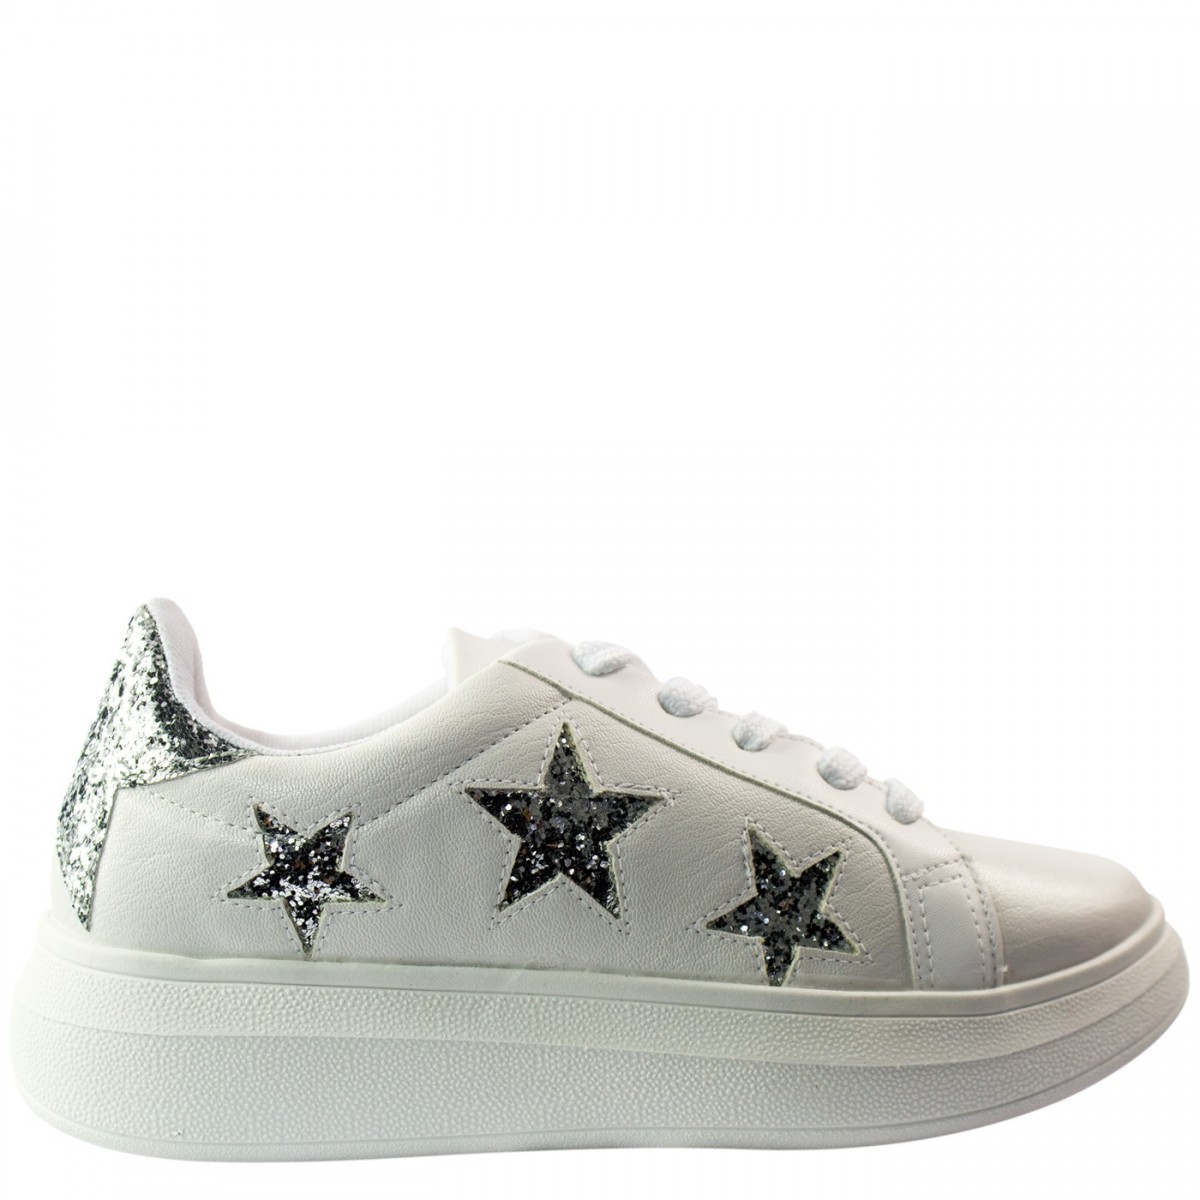 9385d1960d6 Bizz Store - Tênis Feminino Vizzano Estrelas Glitter Branco